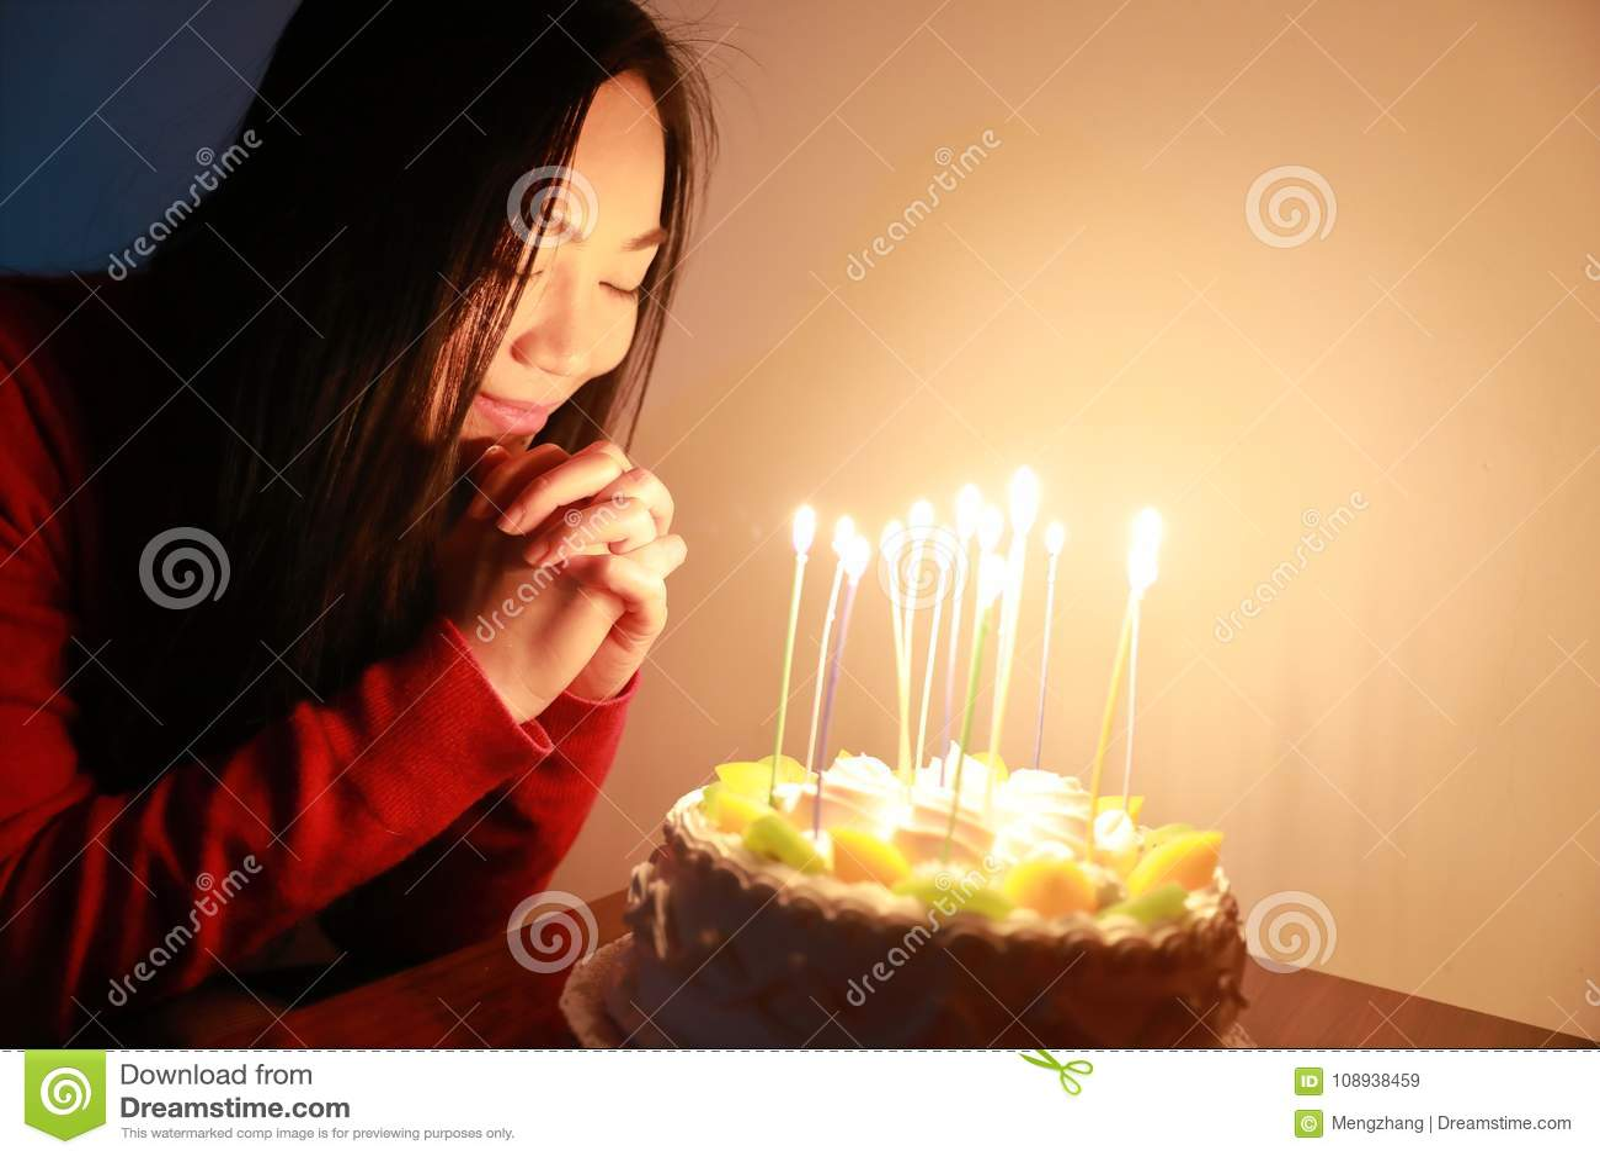 Make A Wish Birthday